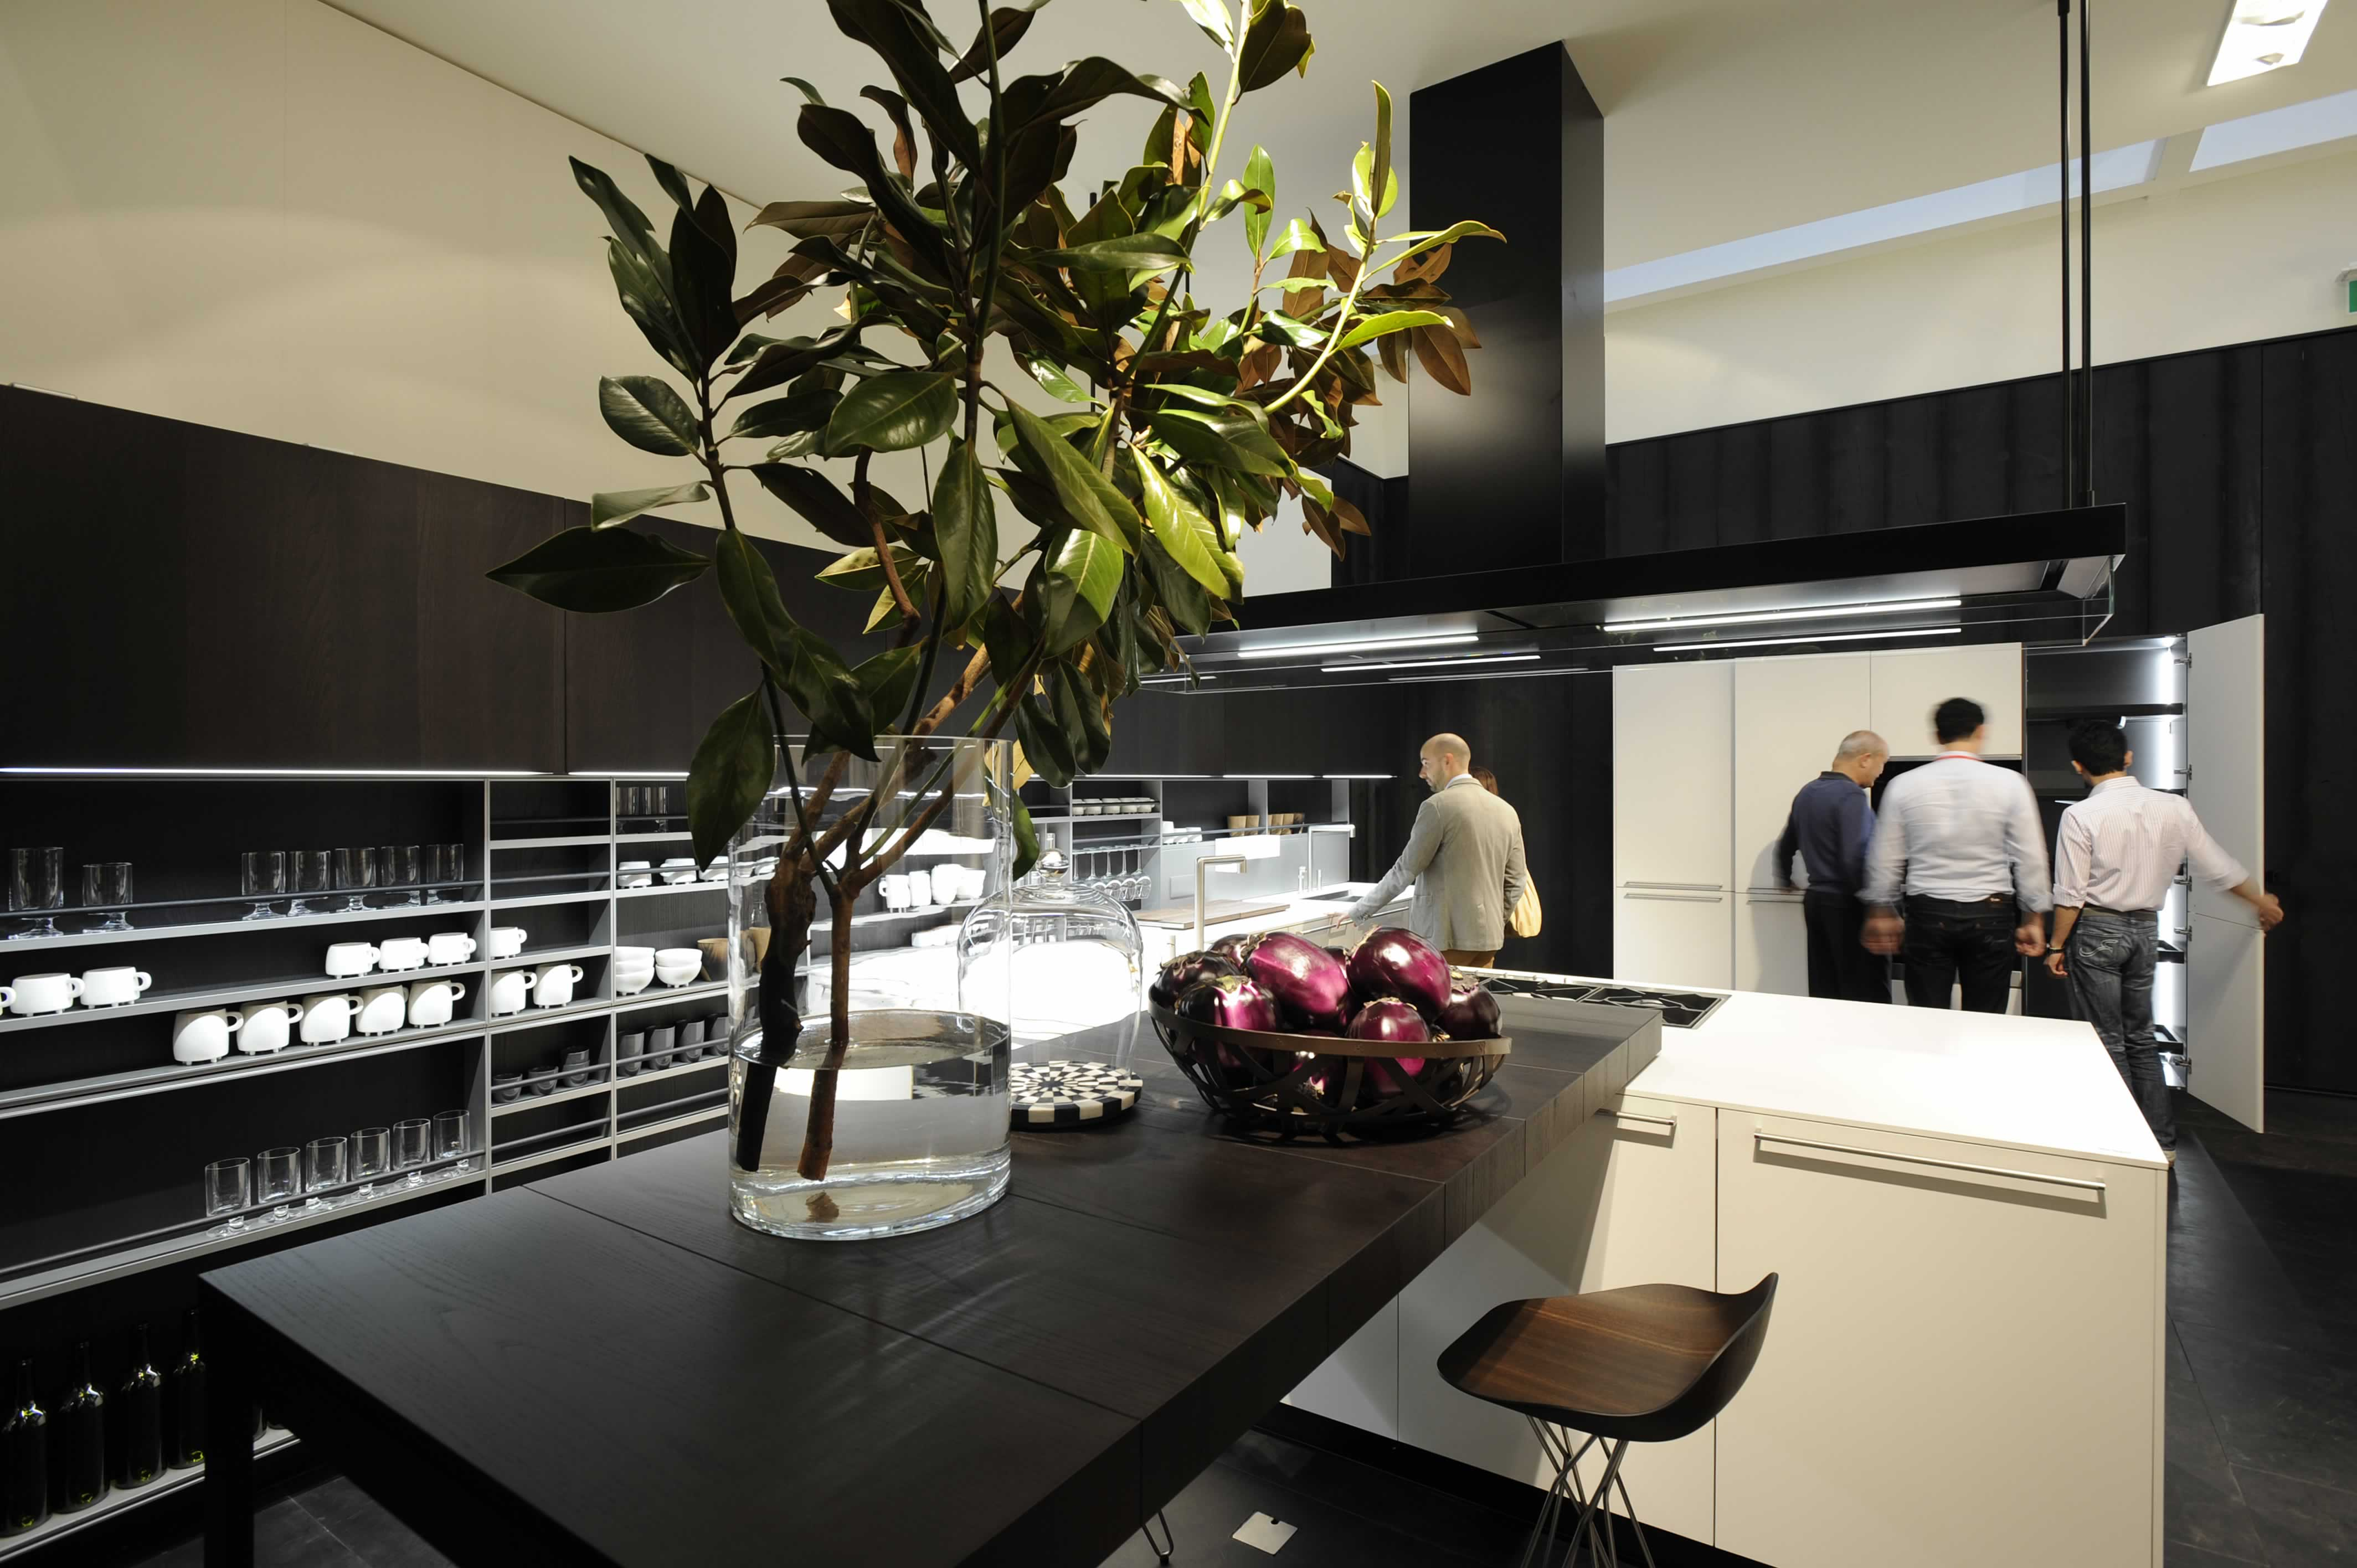 the best kitchen design ideas Eurocucina Visit EuroCucina 2016 for the best kitchen design ideas eurocucina photo by cm 003 13719494883 o